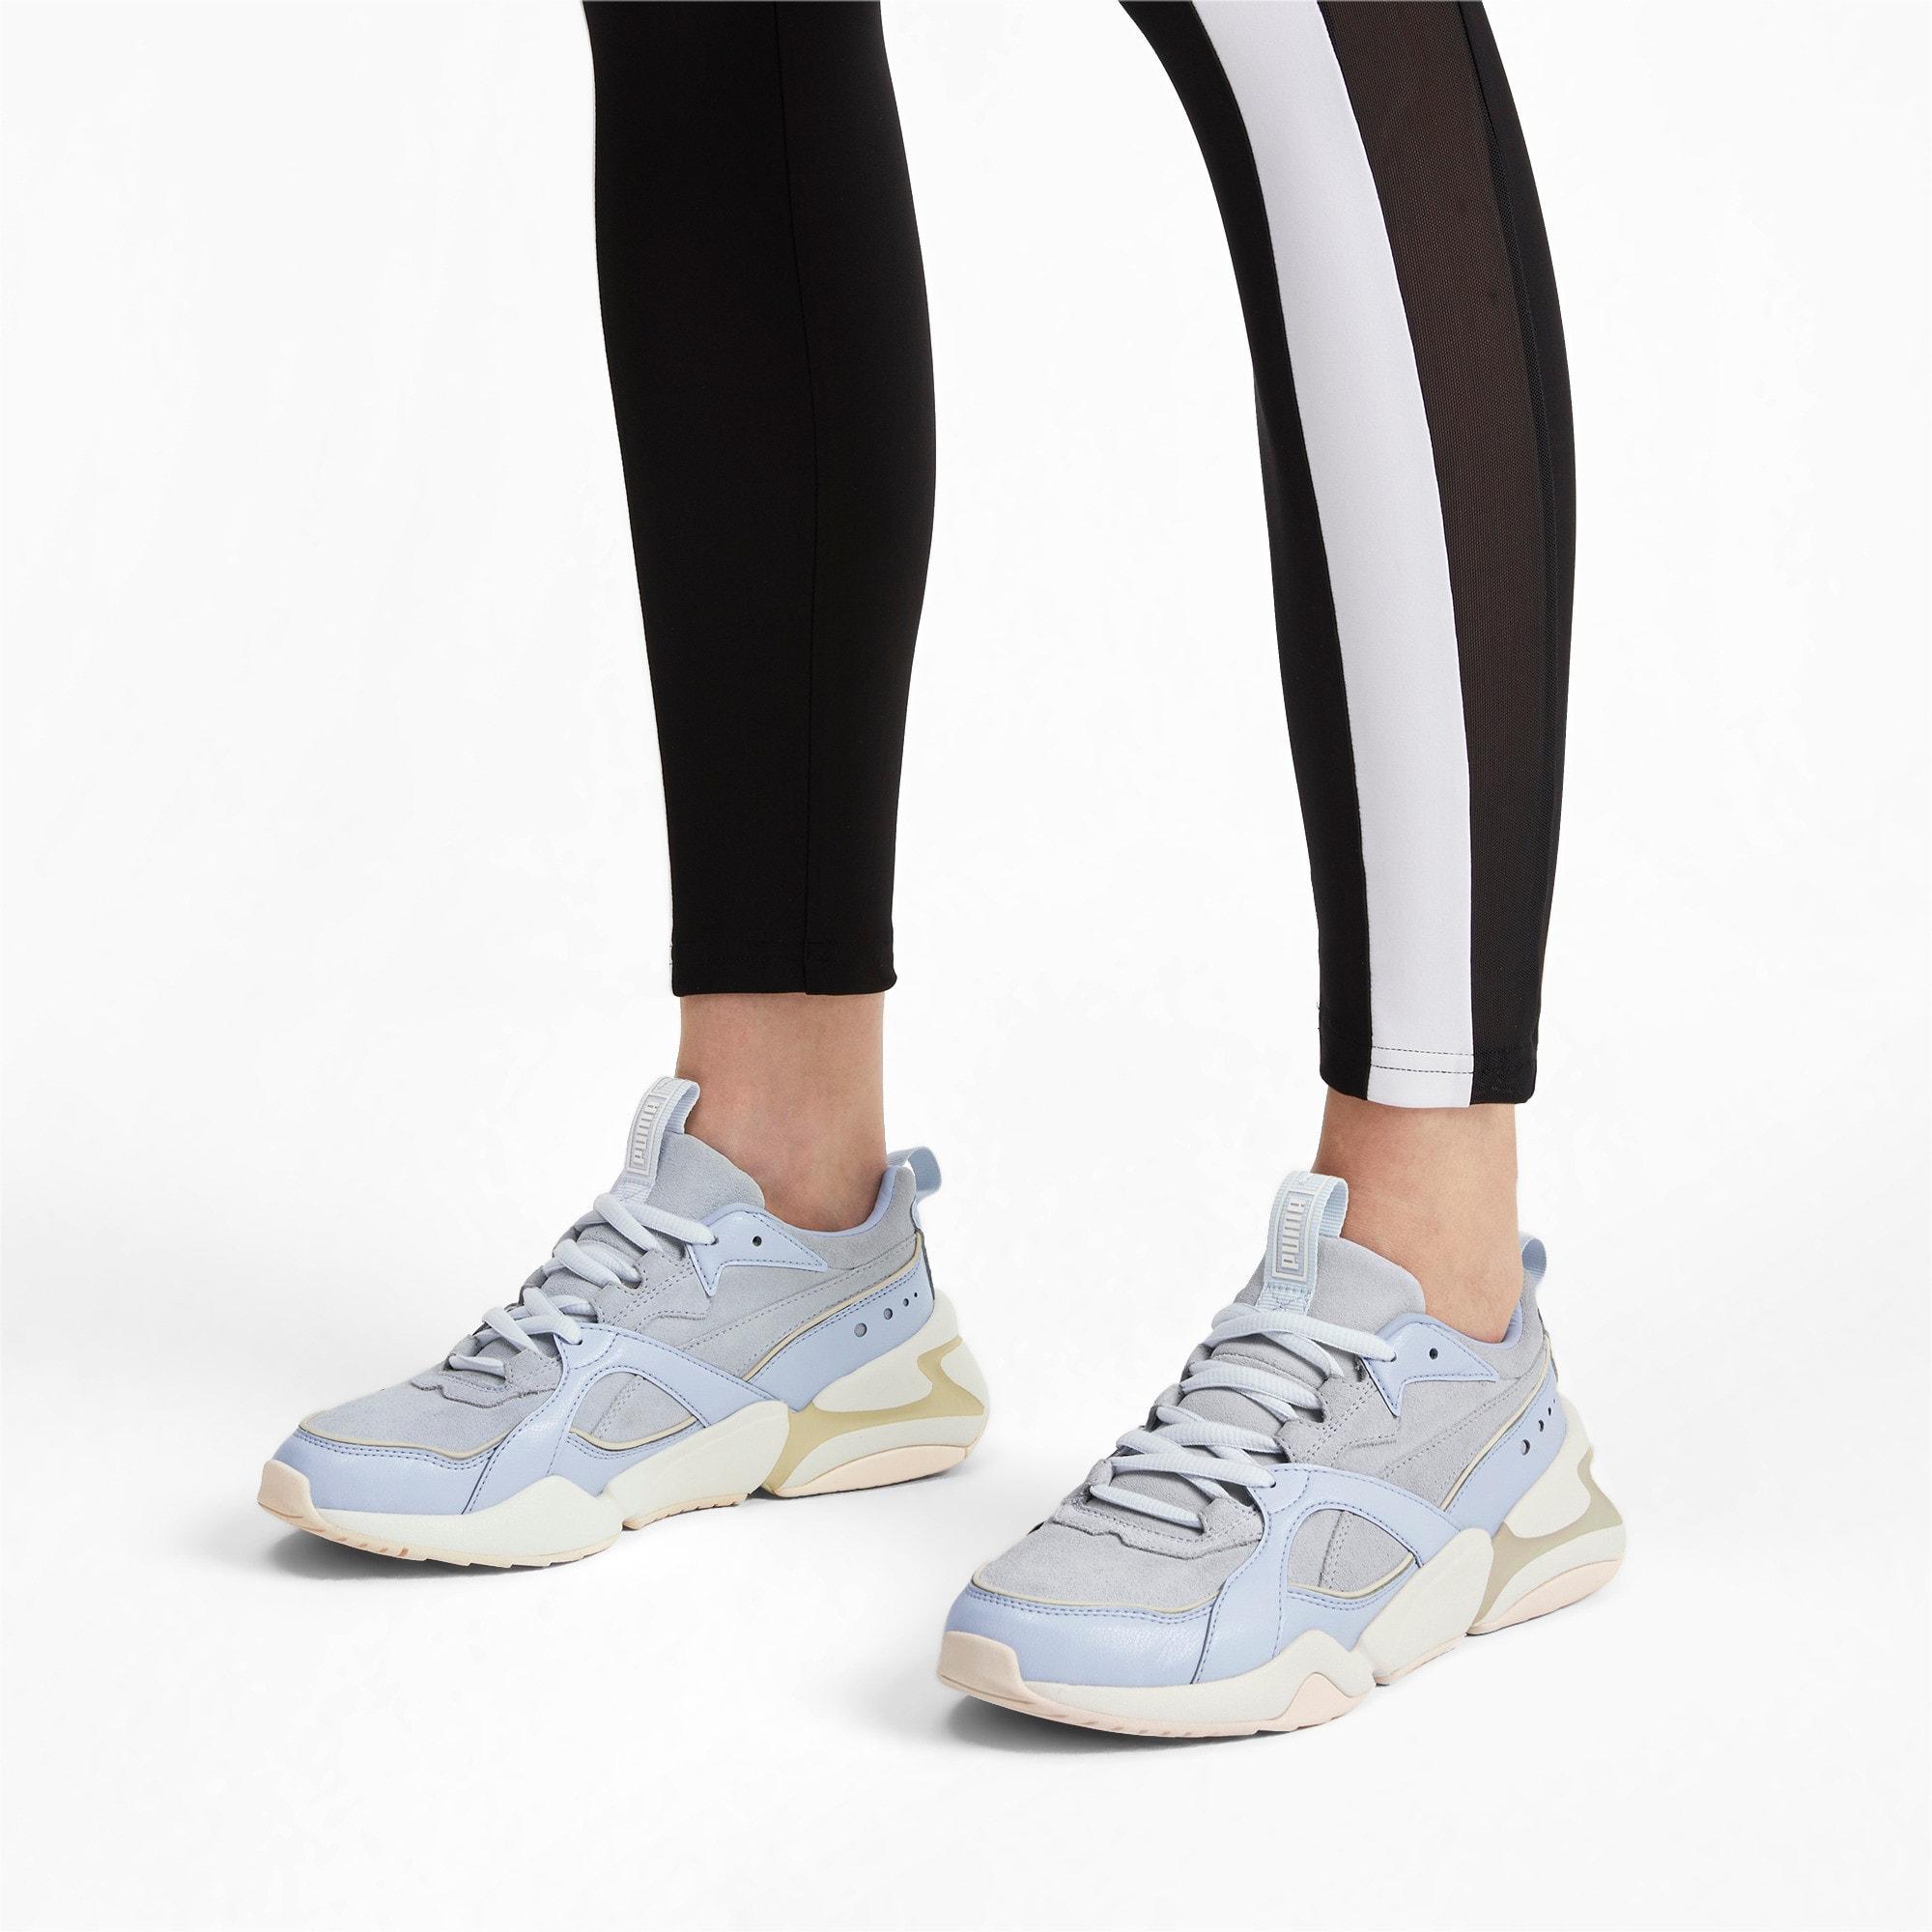 Thumbnail 2 of Nova 2 Suede Women's Sneakers, Heather-Whisper White, medium